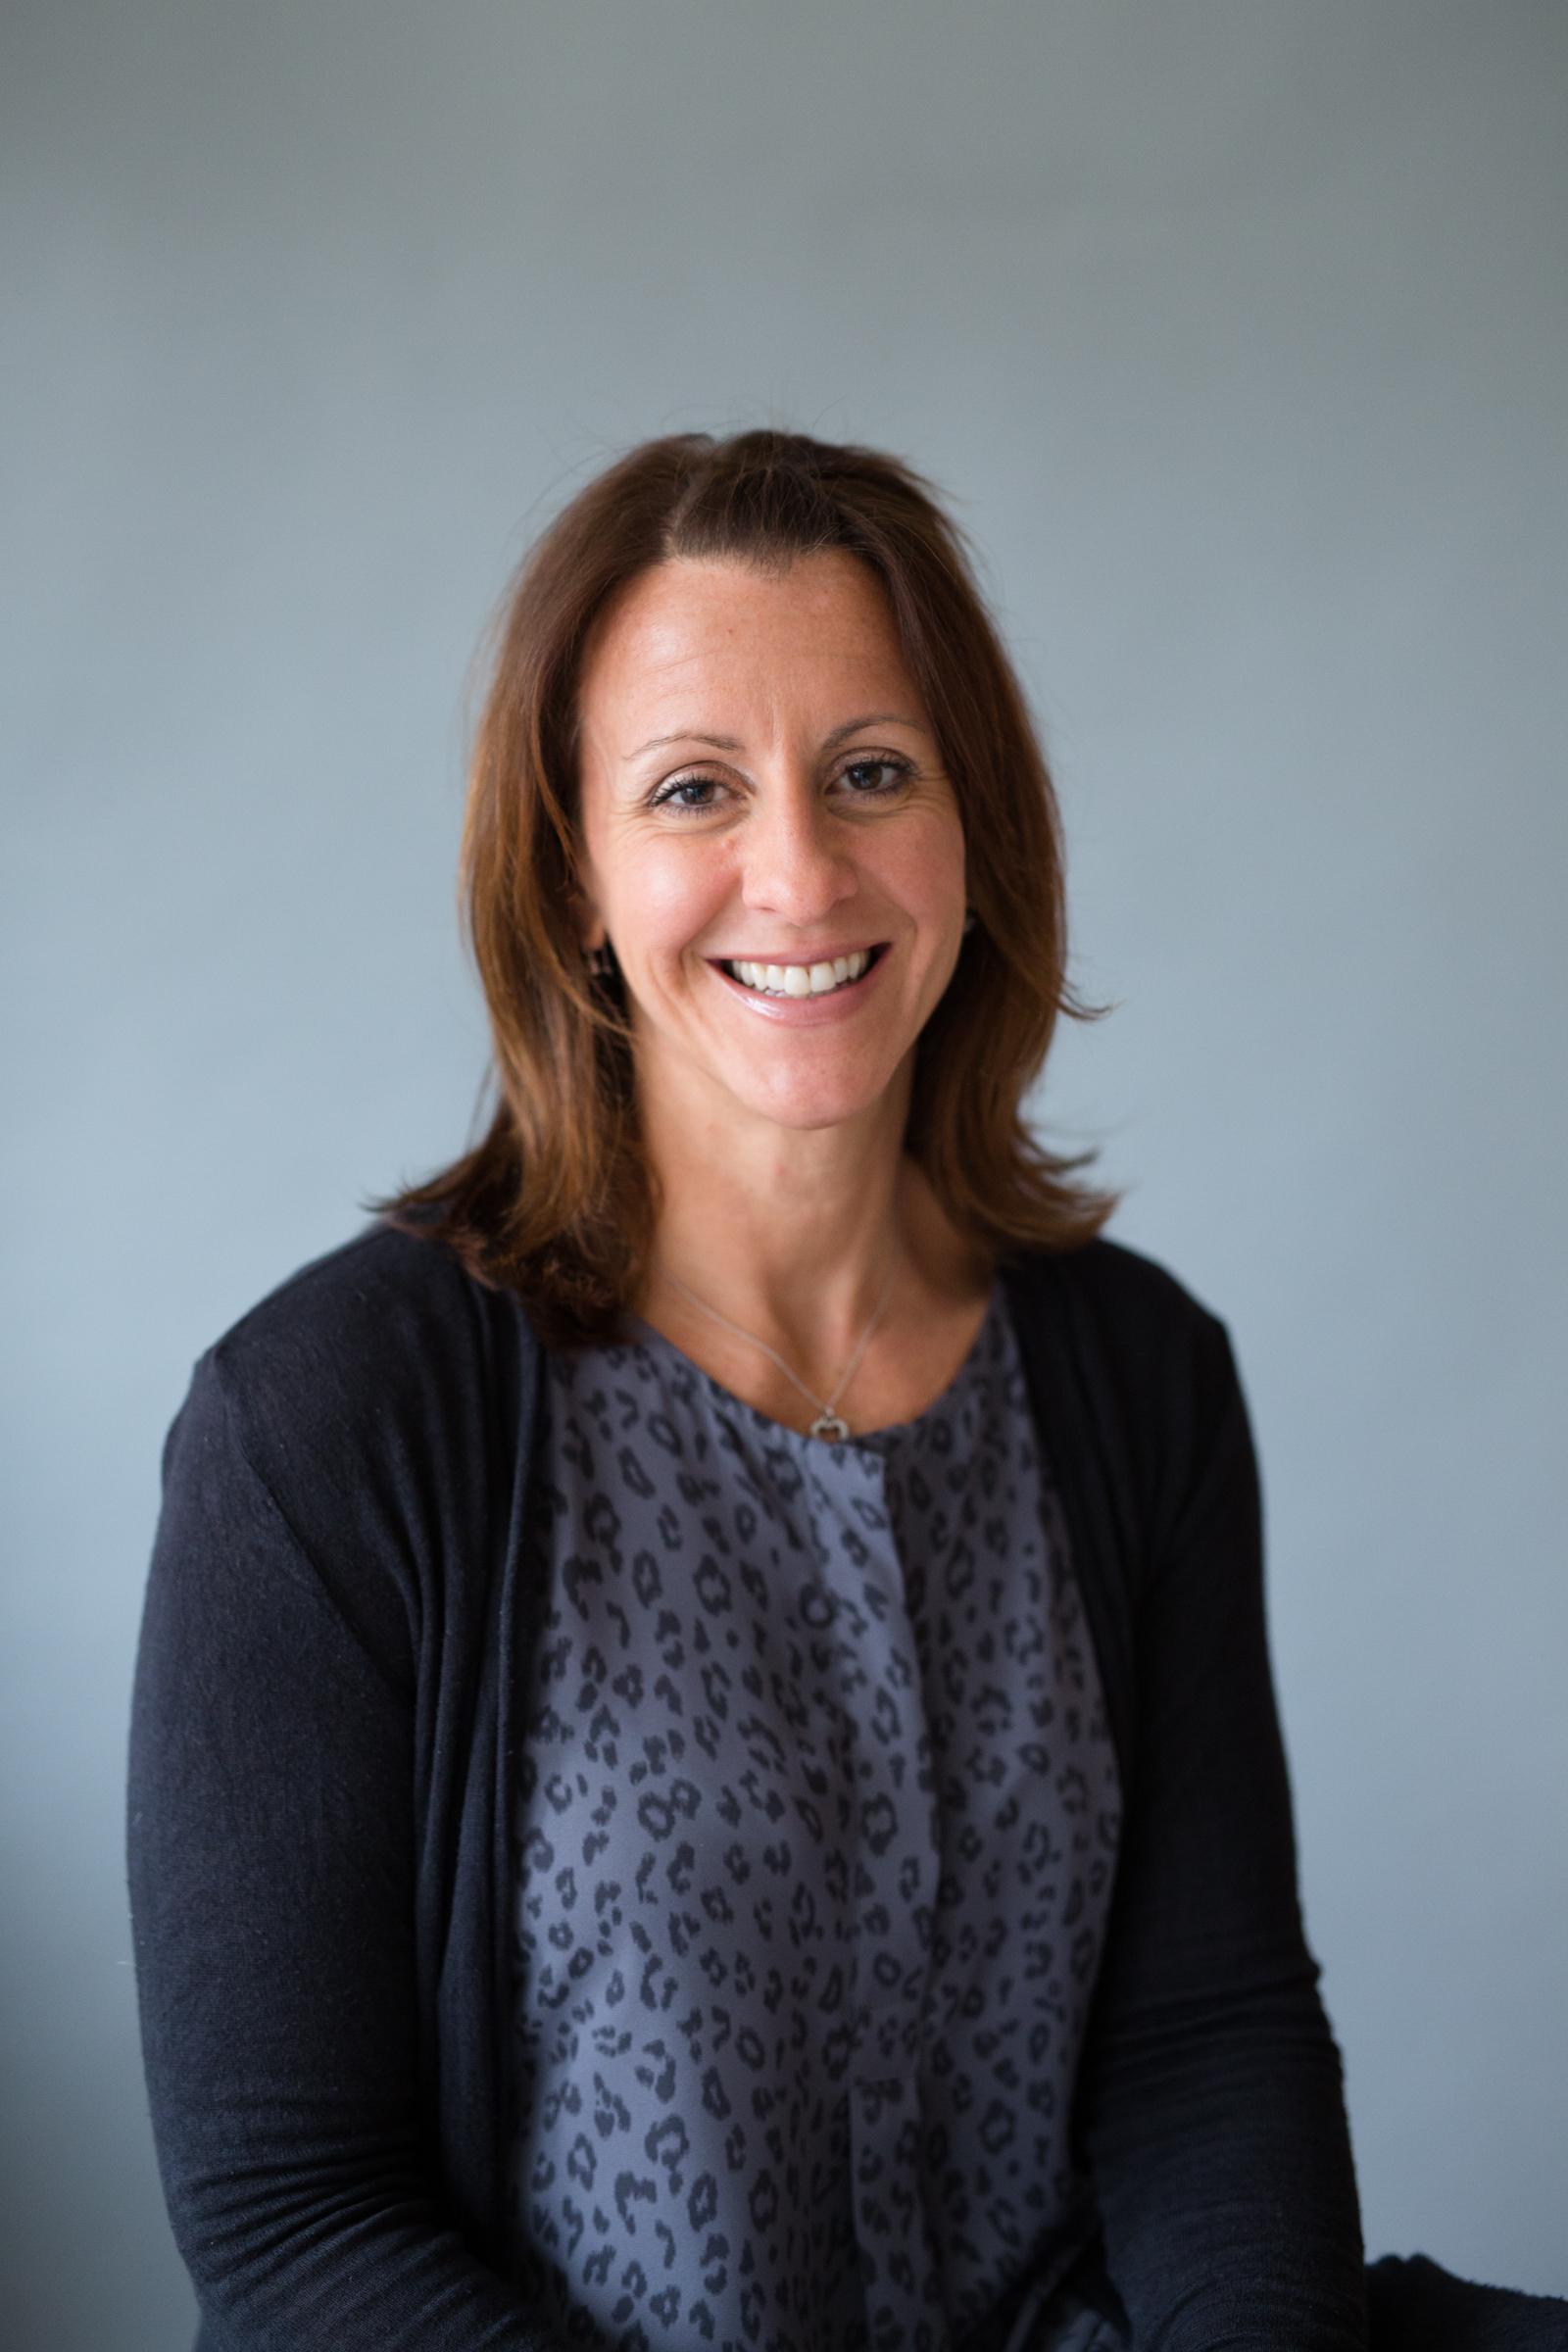 Pam Solomon